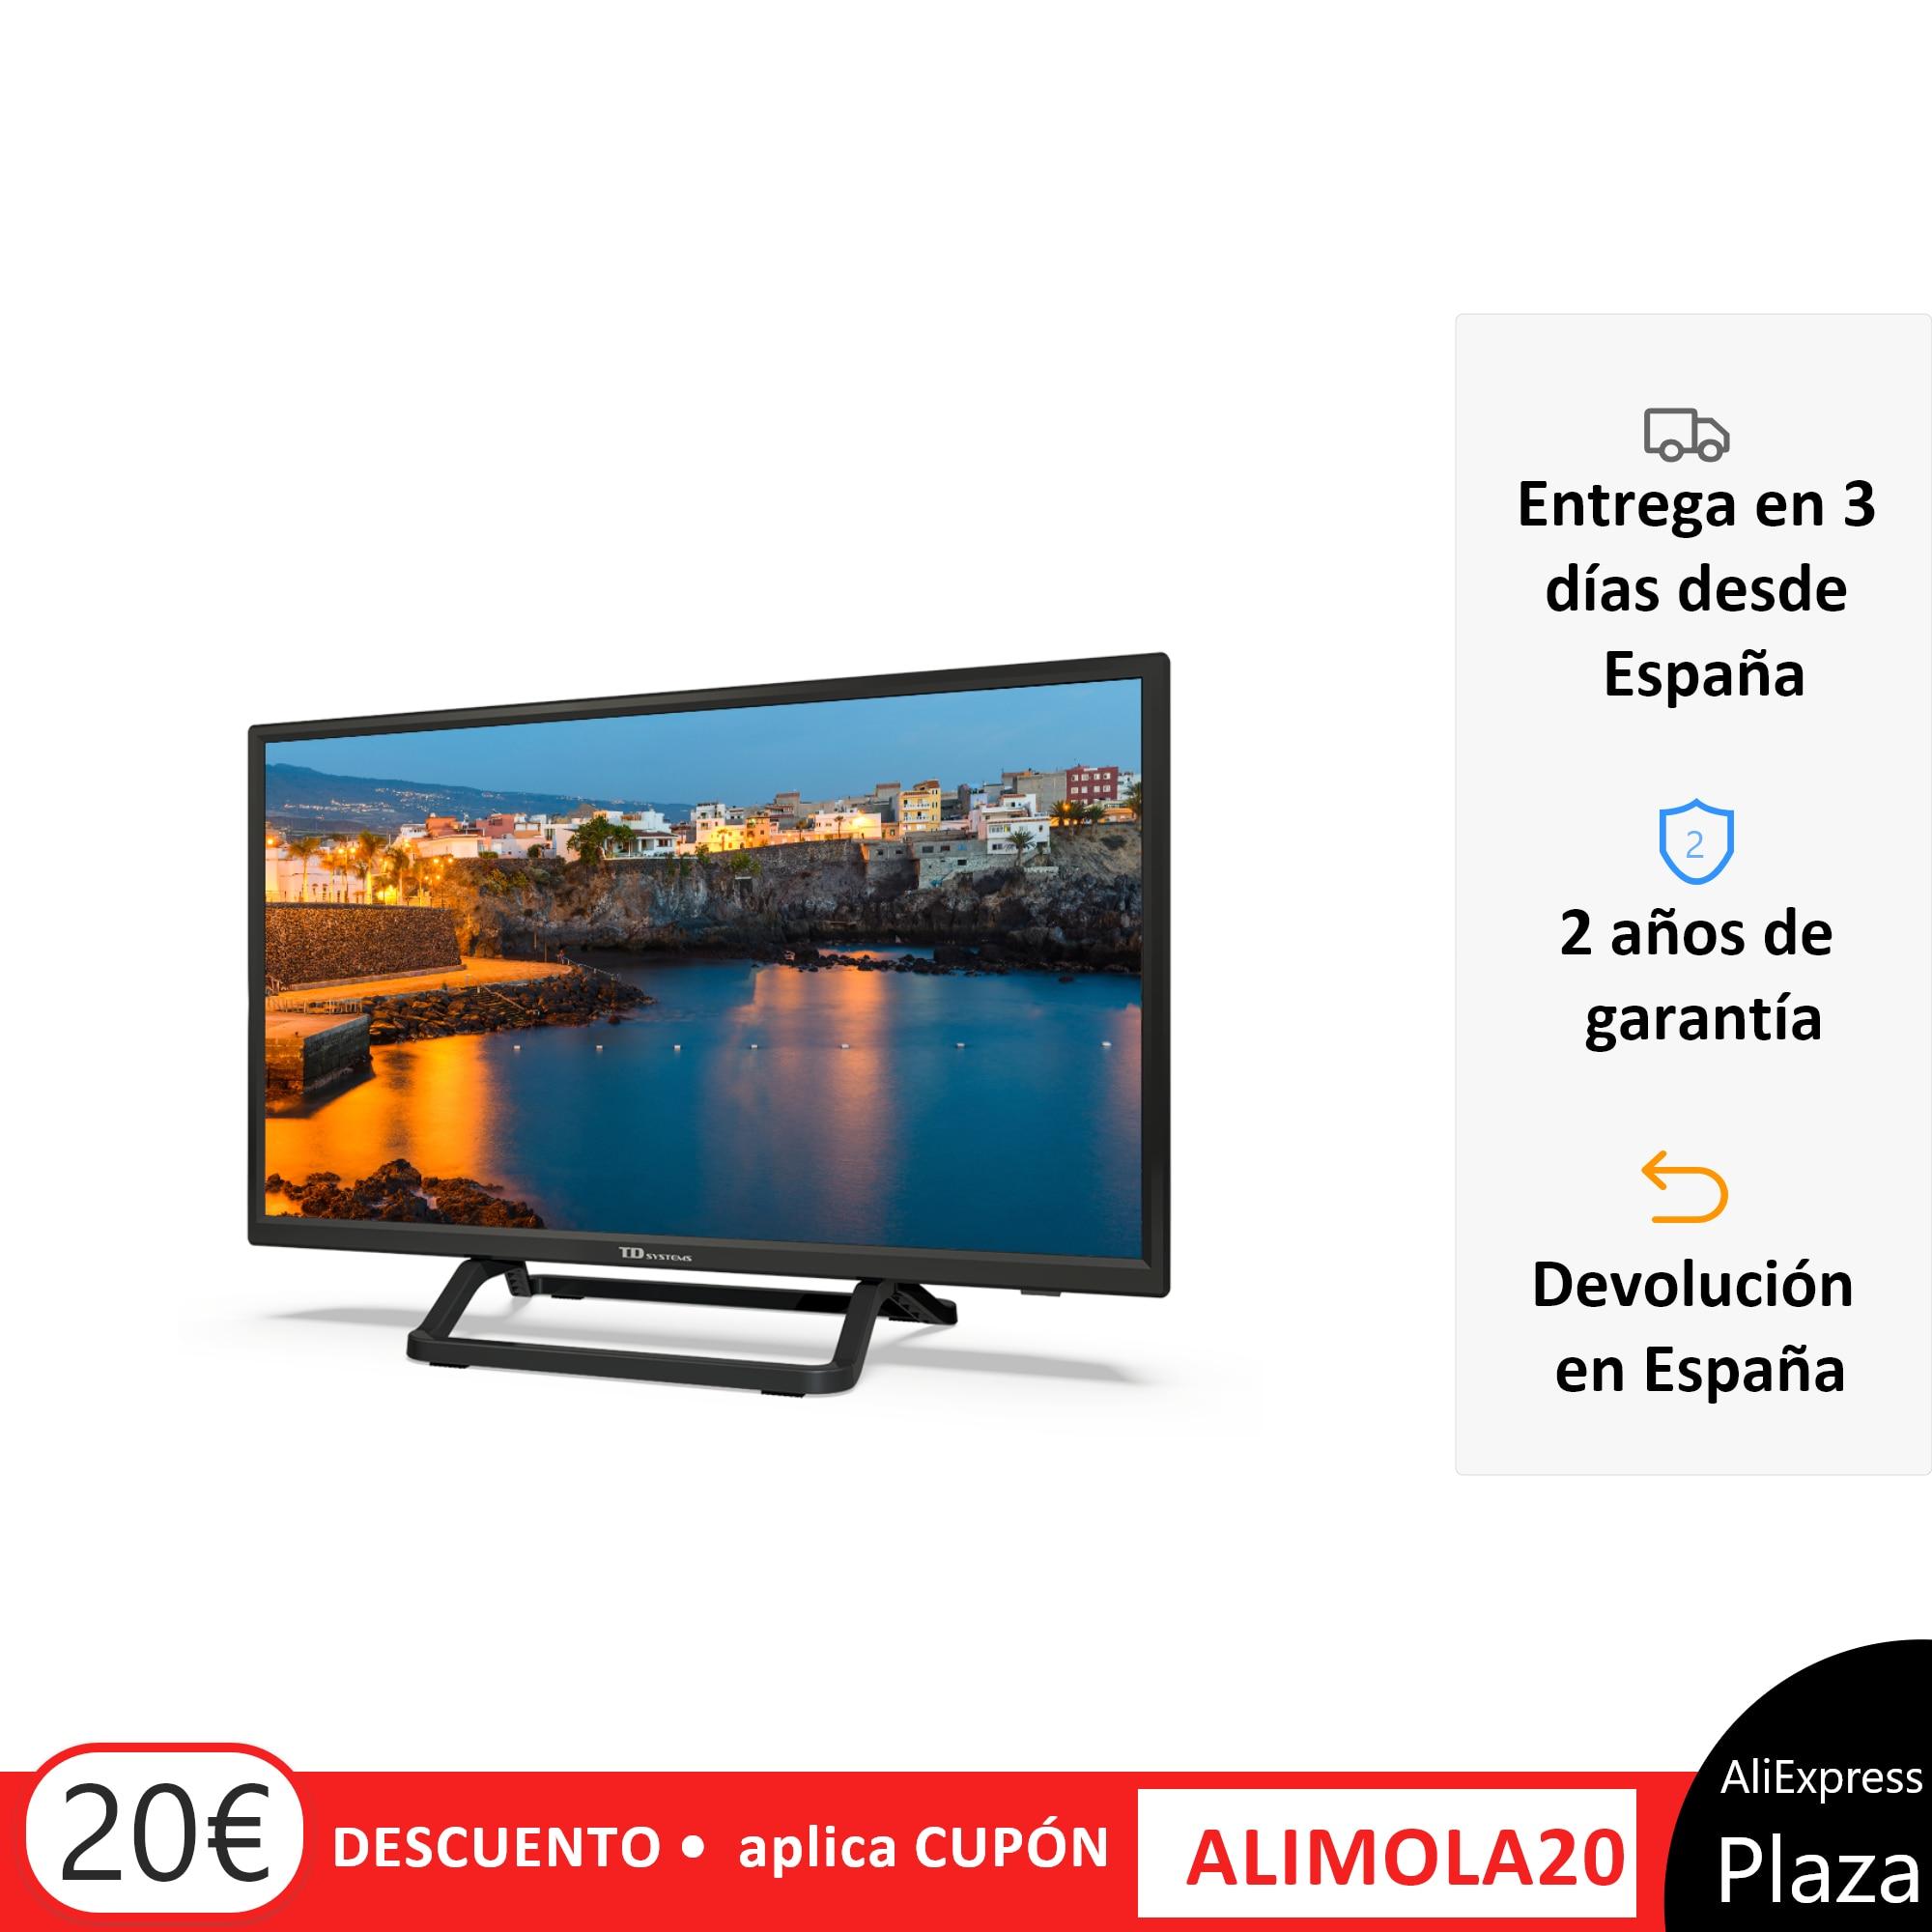 Led TV TD SETS Smart TV. 24 zoll HD Smart, modell K24DLX9HS. 1366x768 auflösung, 2x HDMI, 2x USB